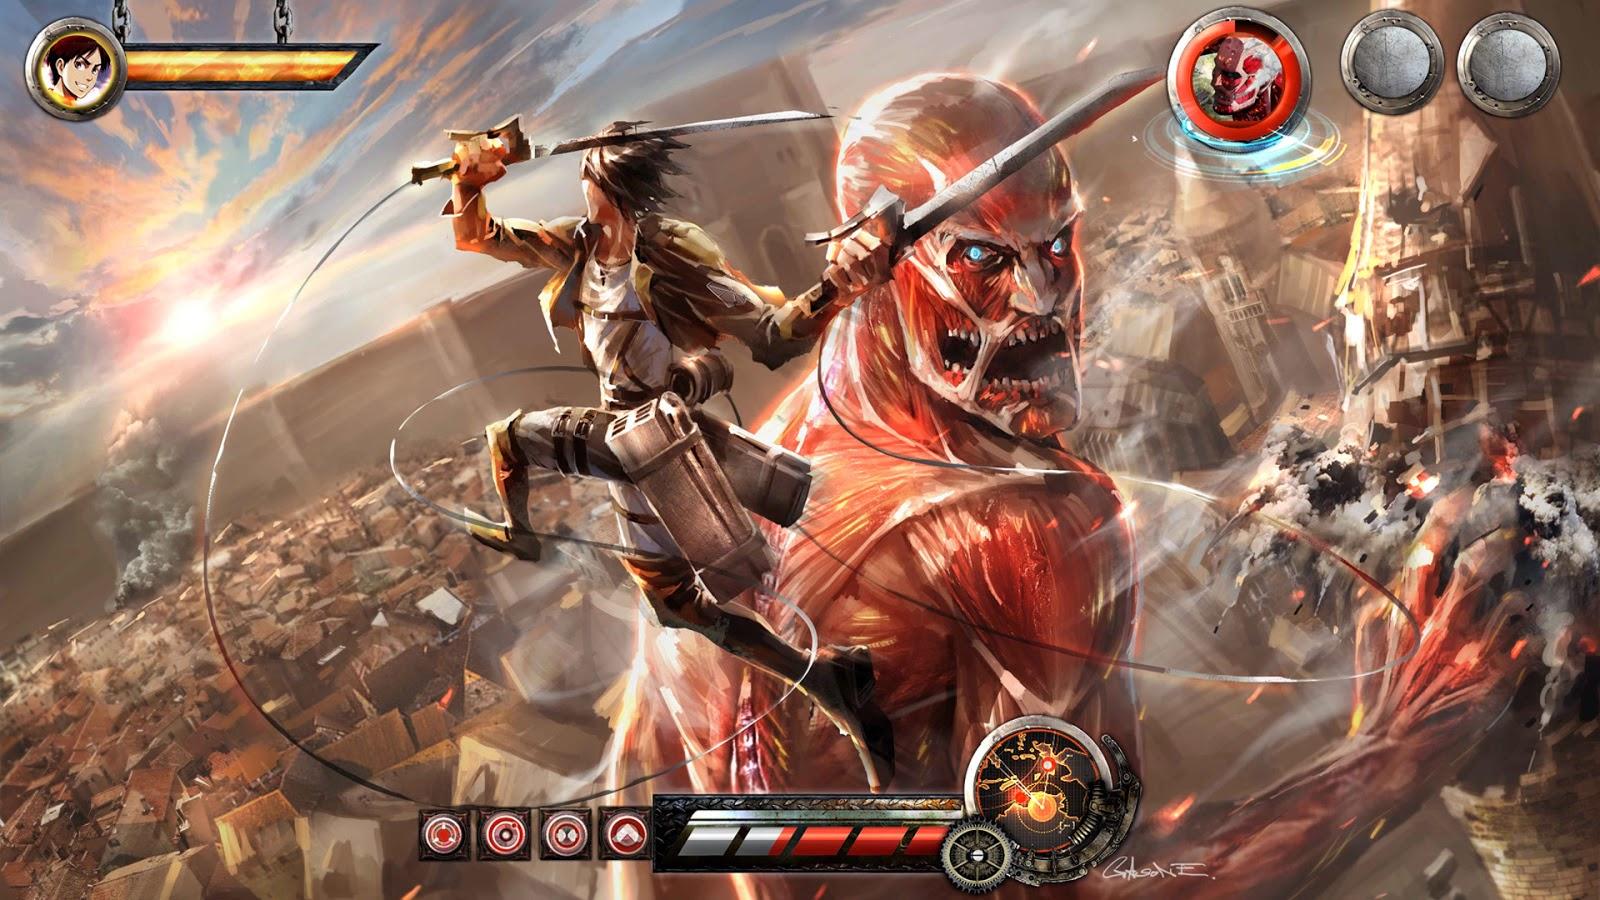 eren vs colossal titan video game attack on titan shingeki no kyojin 1600x900